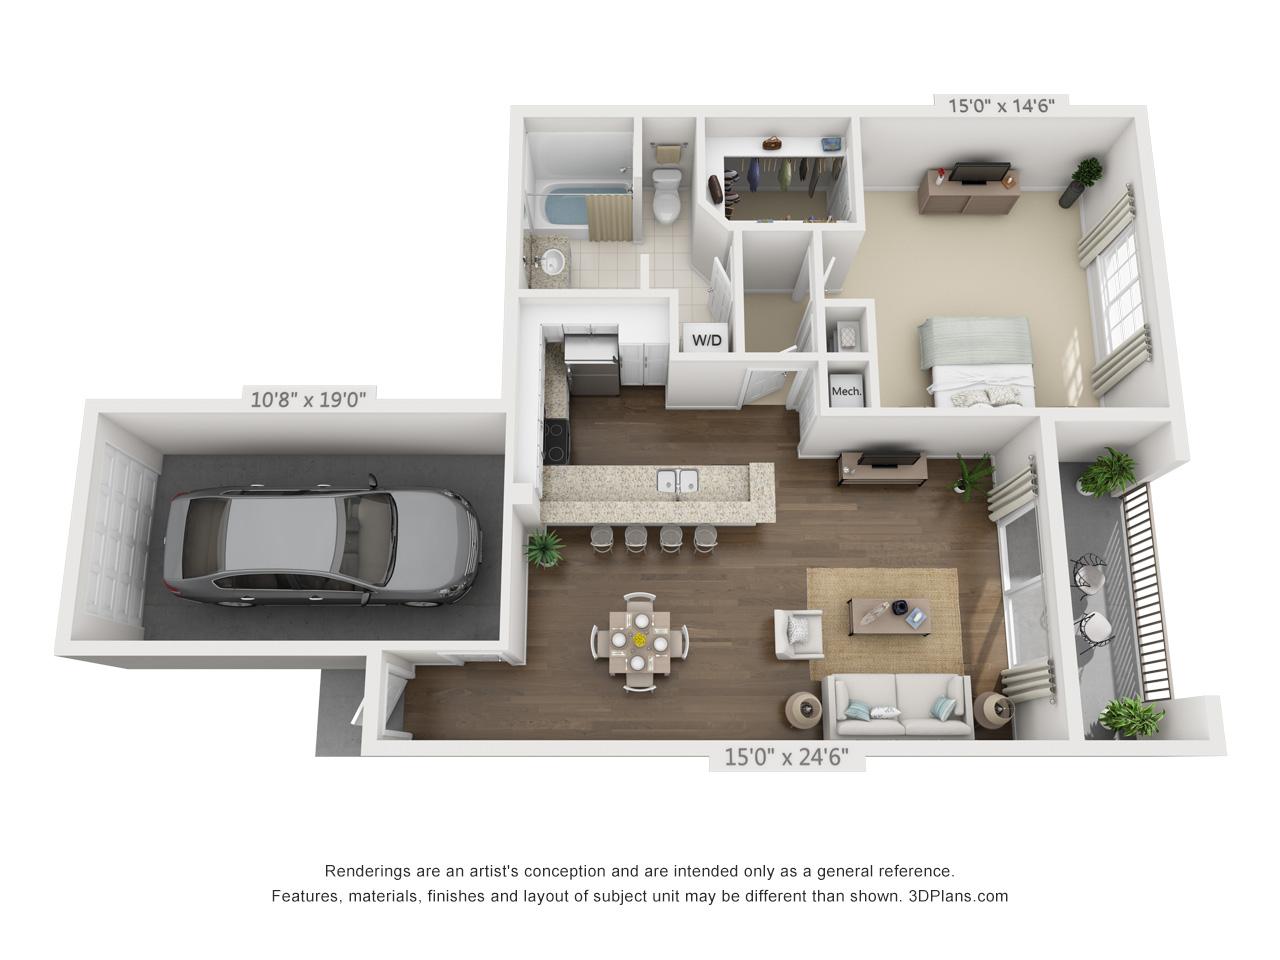 1 bedroom apartment in pembroke pines